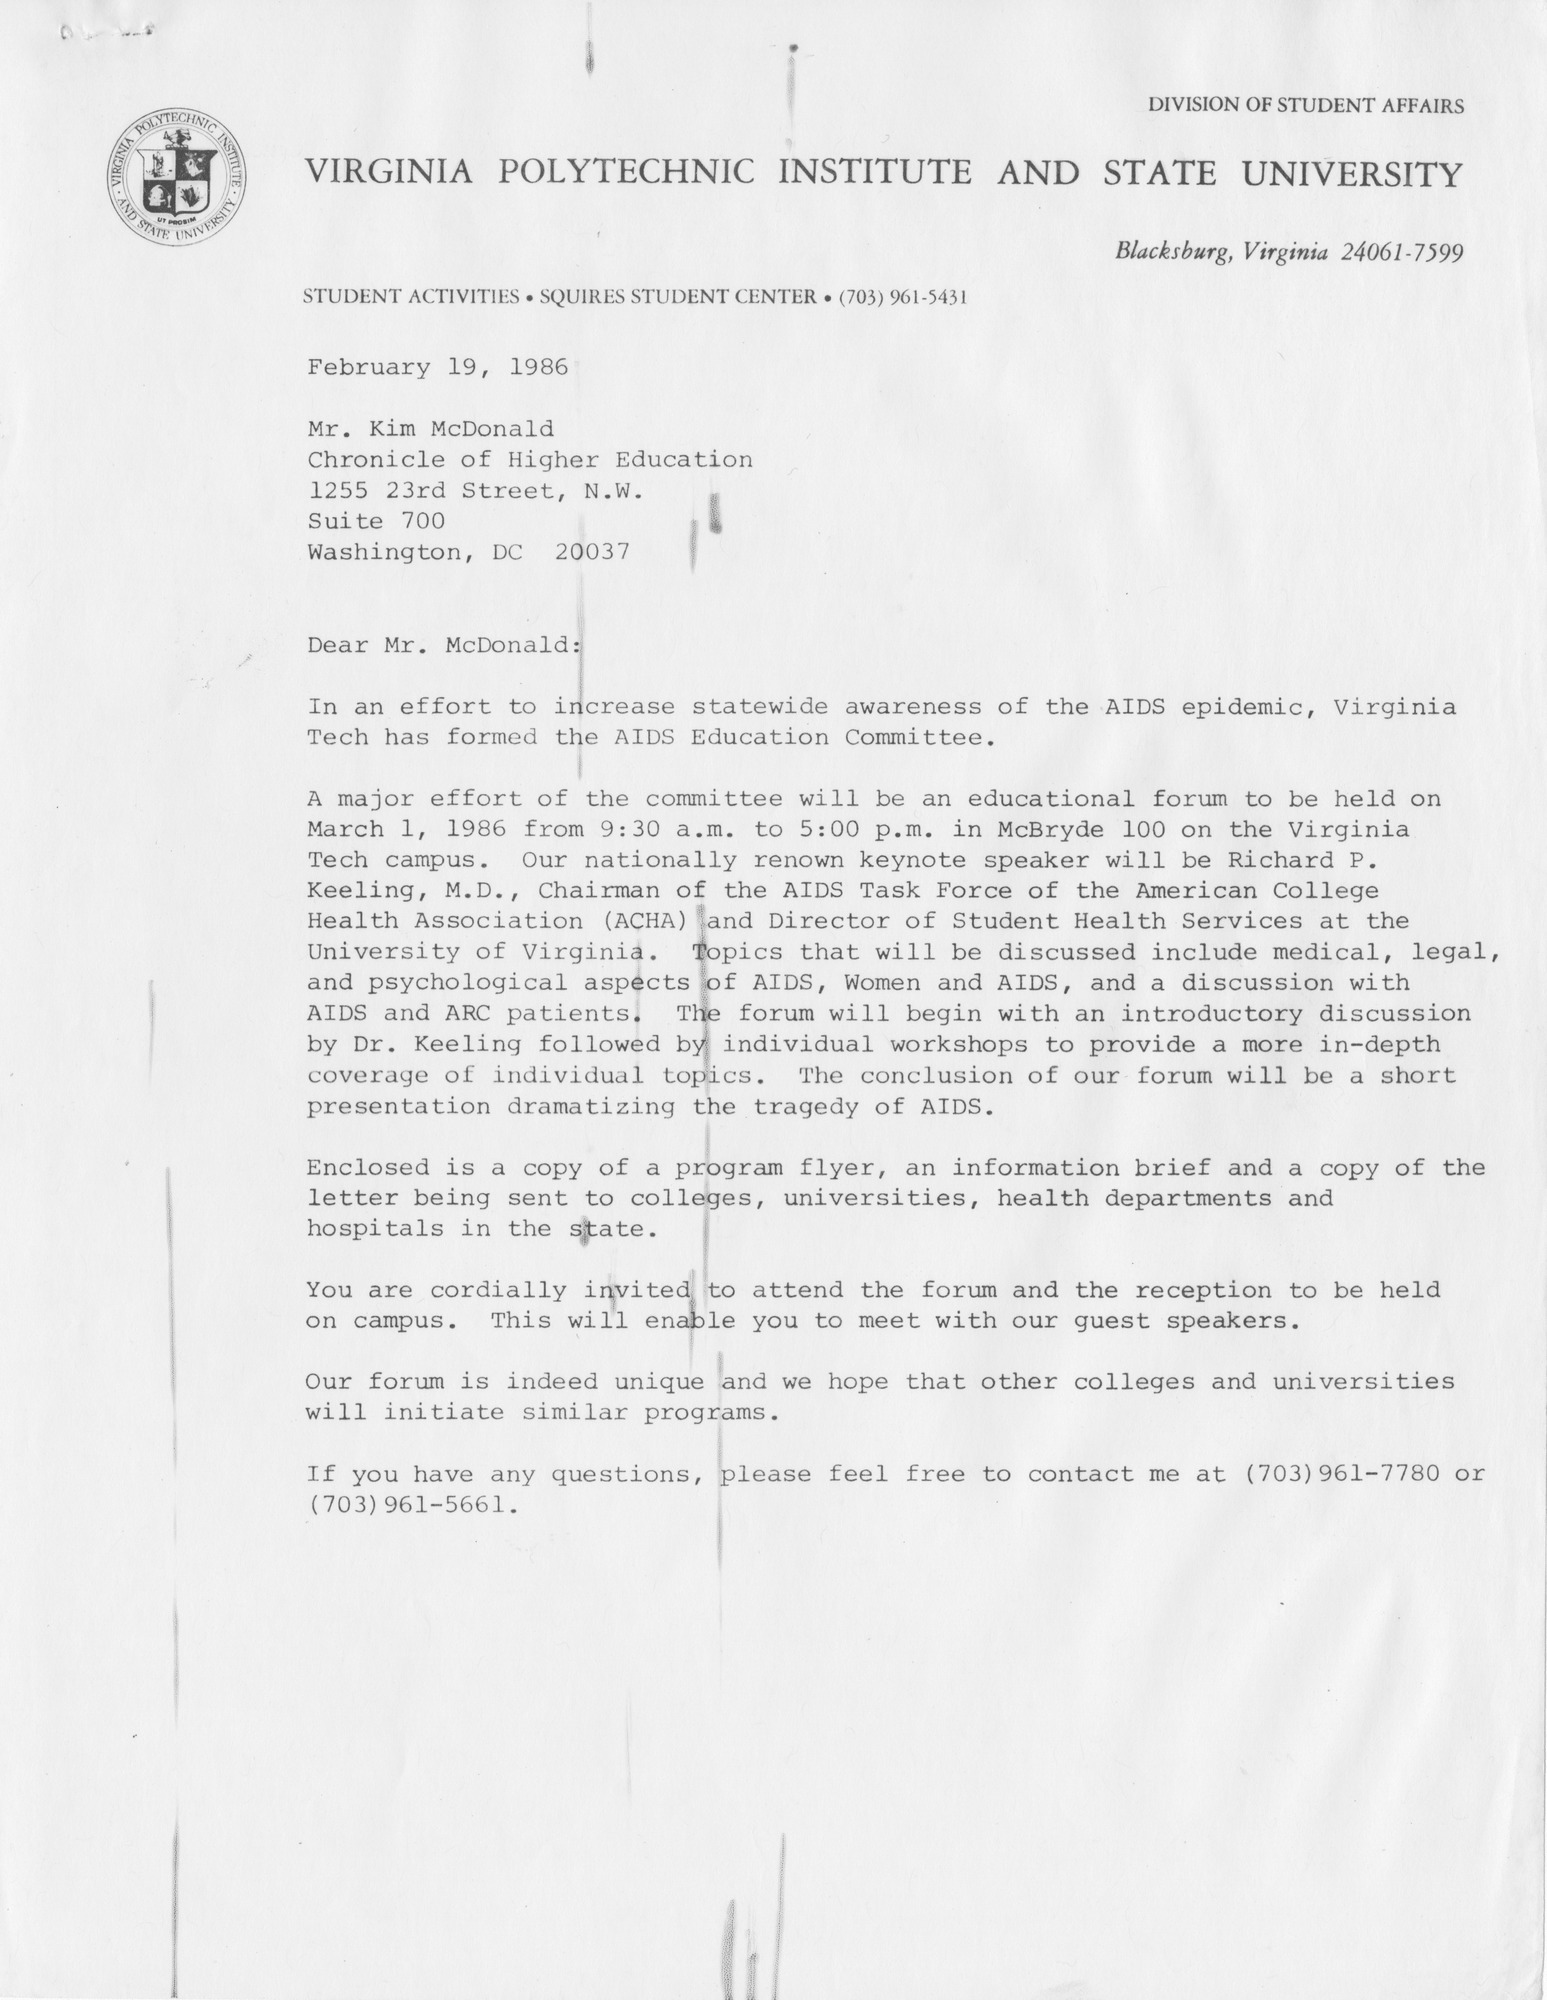 Ms2014-010_WeberMark_CorrespondenceKimMcDonald_1986_0219a.jpg